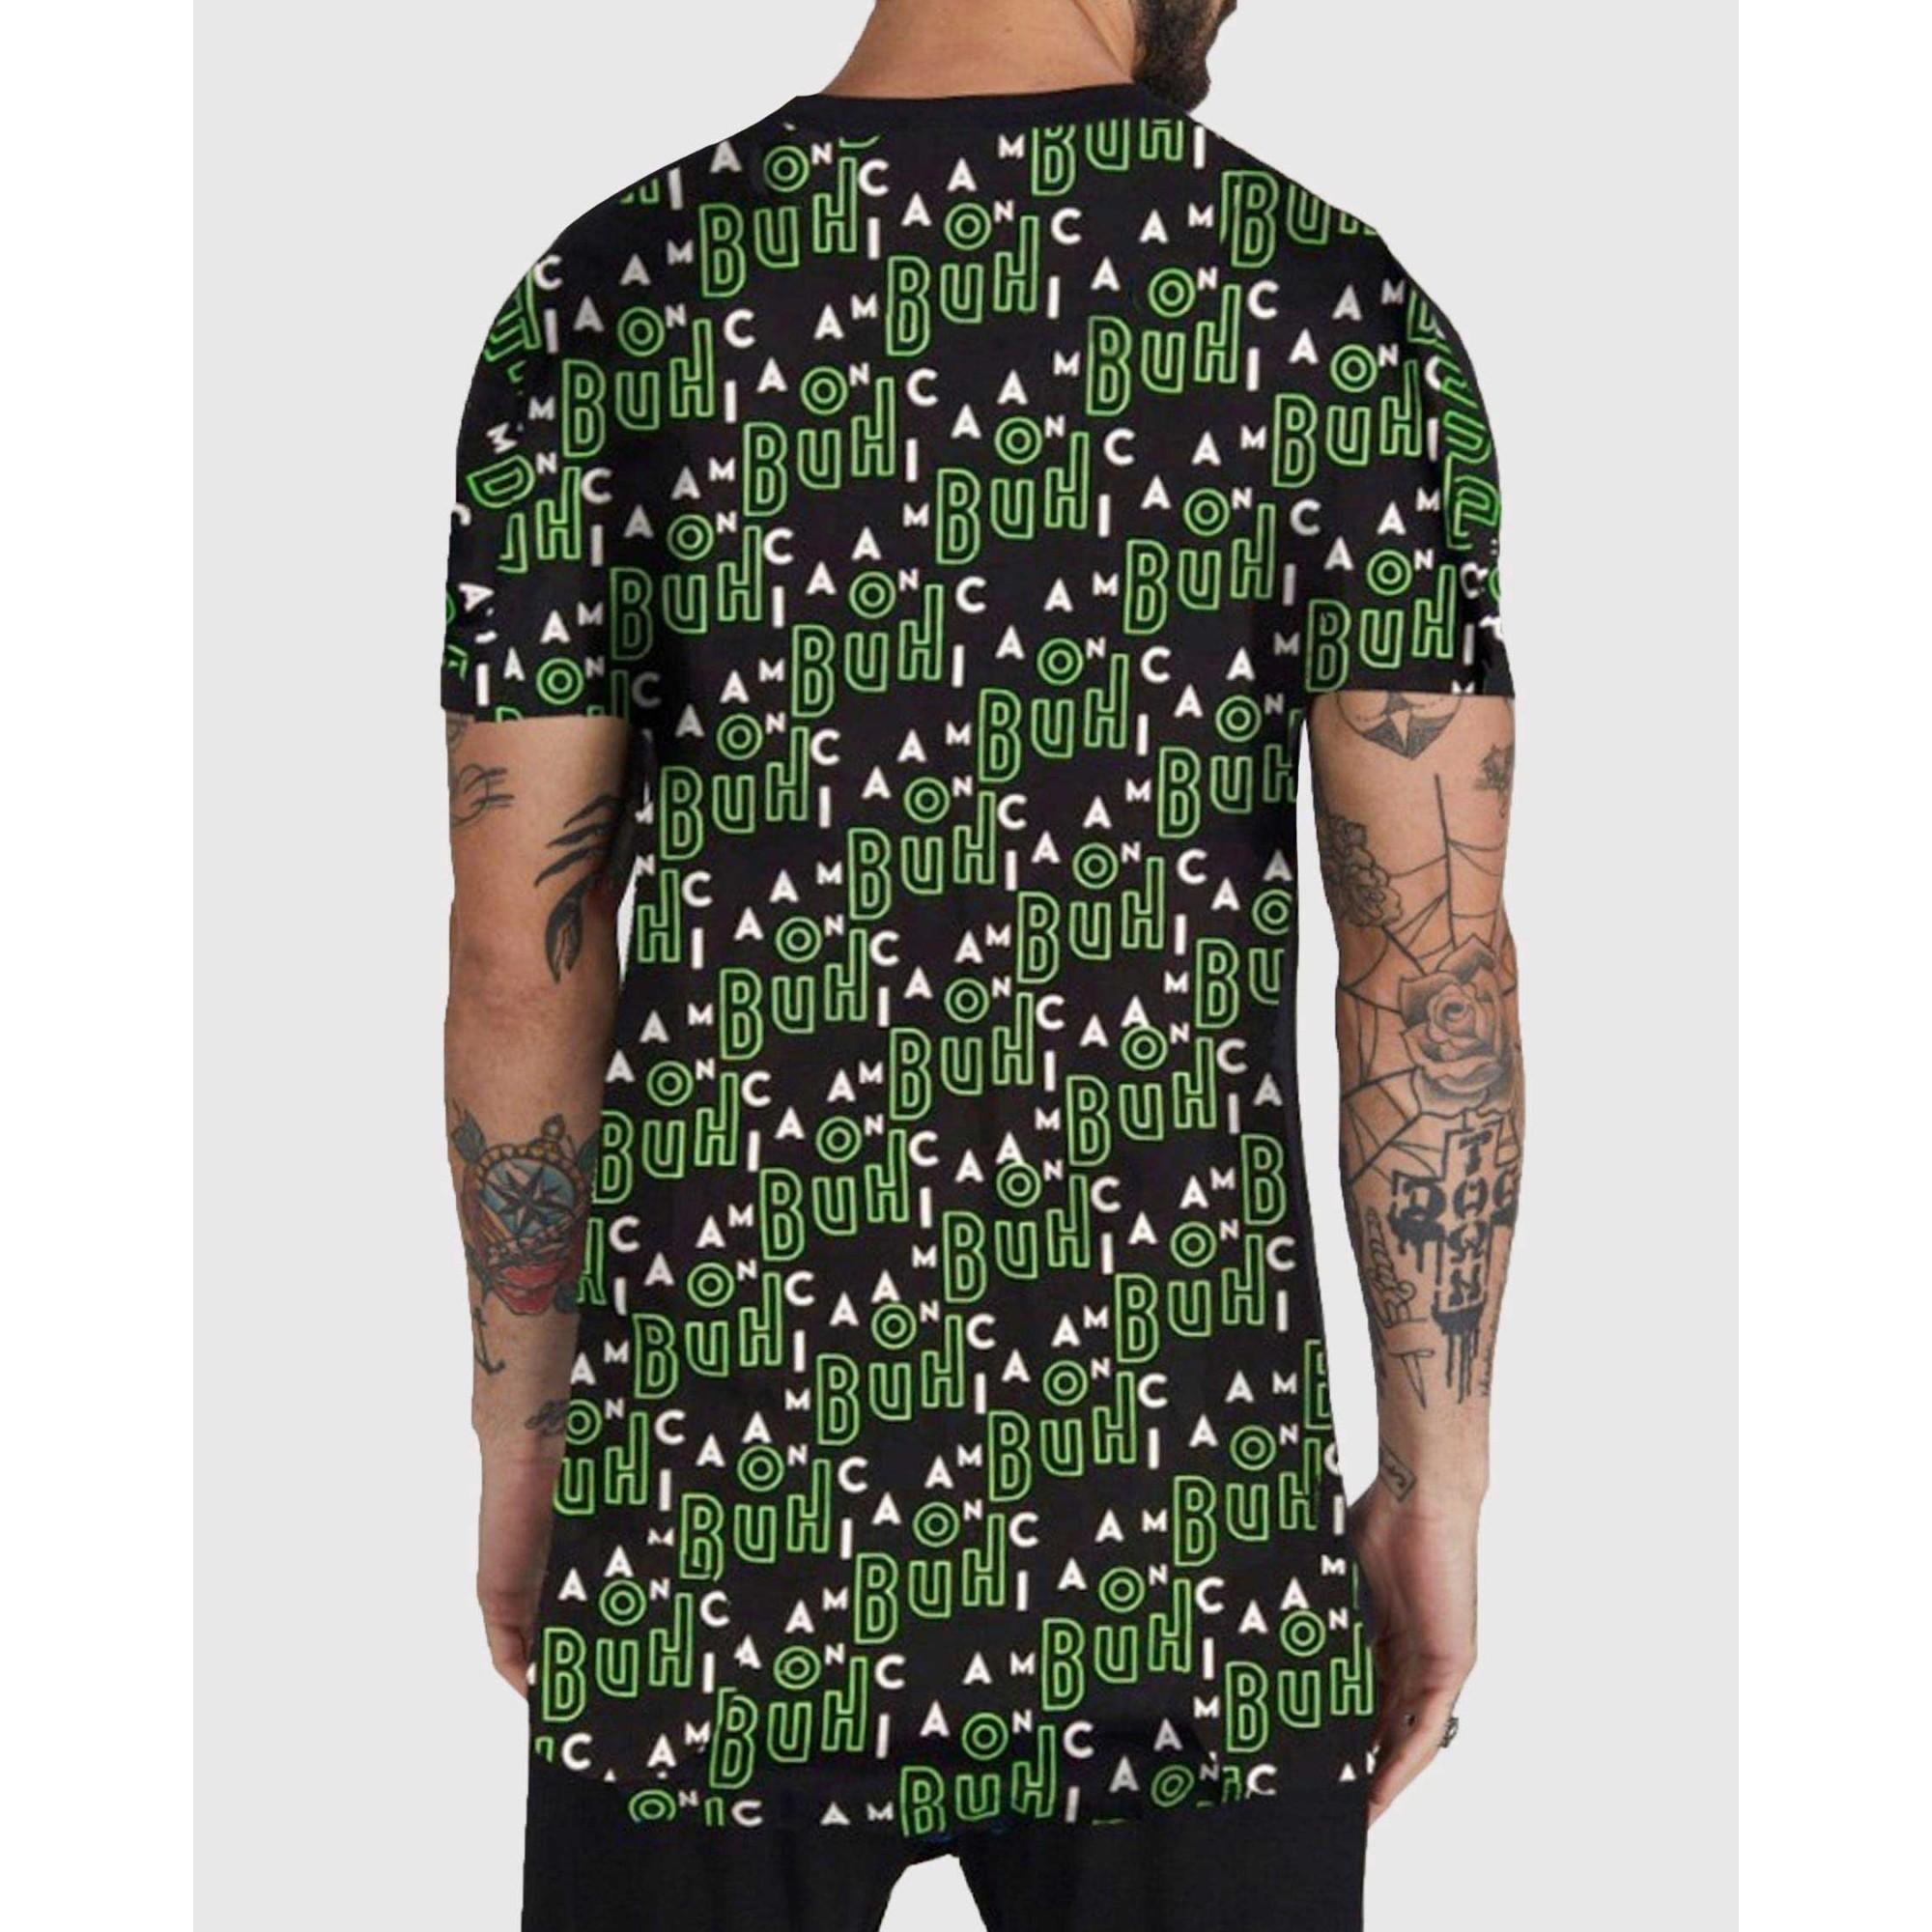 Camiseta Buh Full Maniac Black